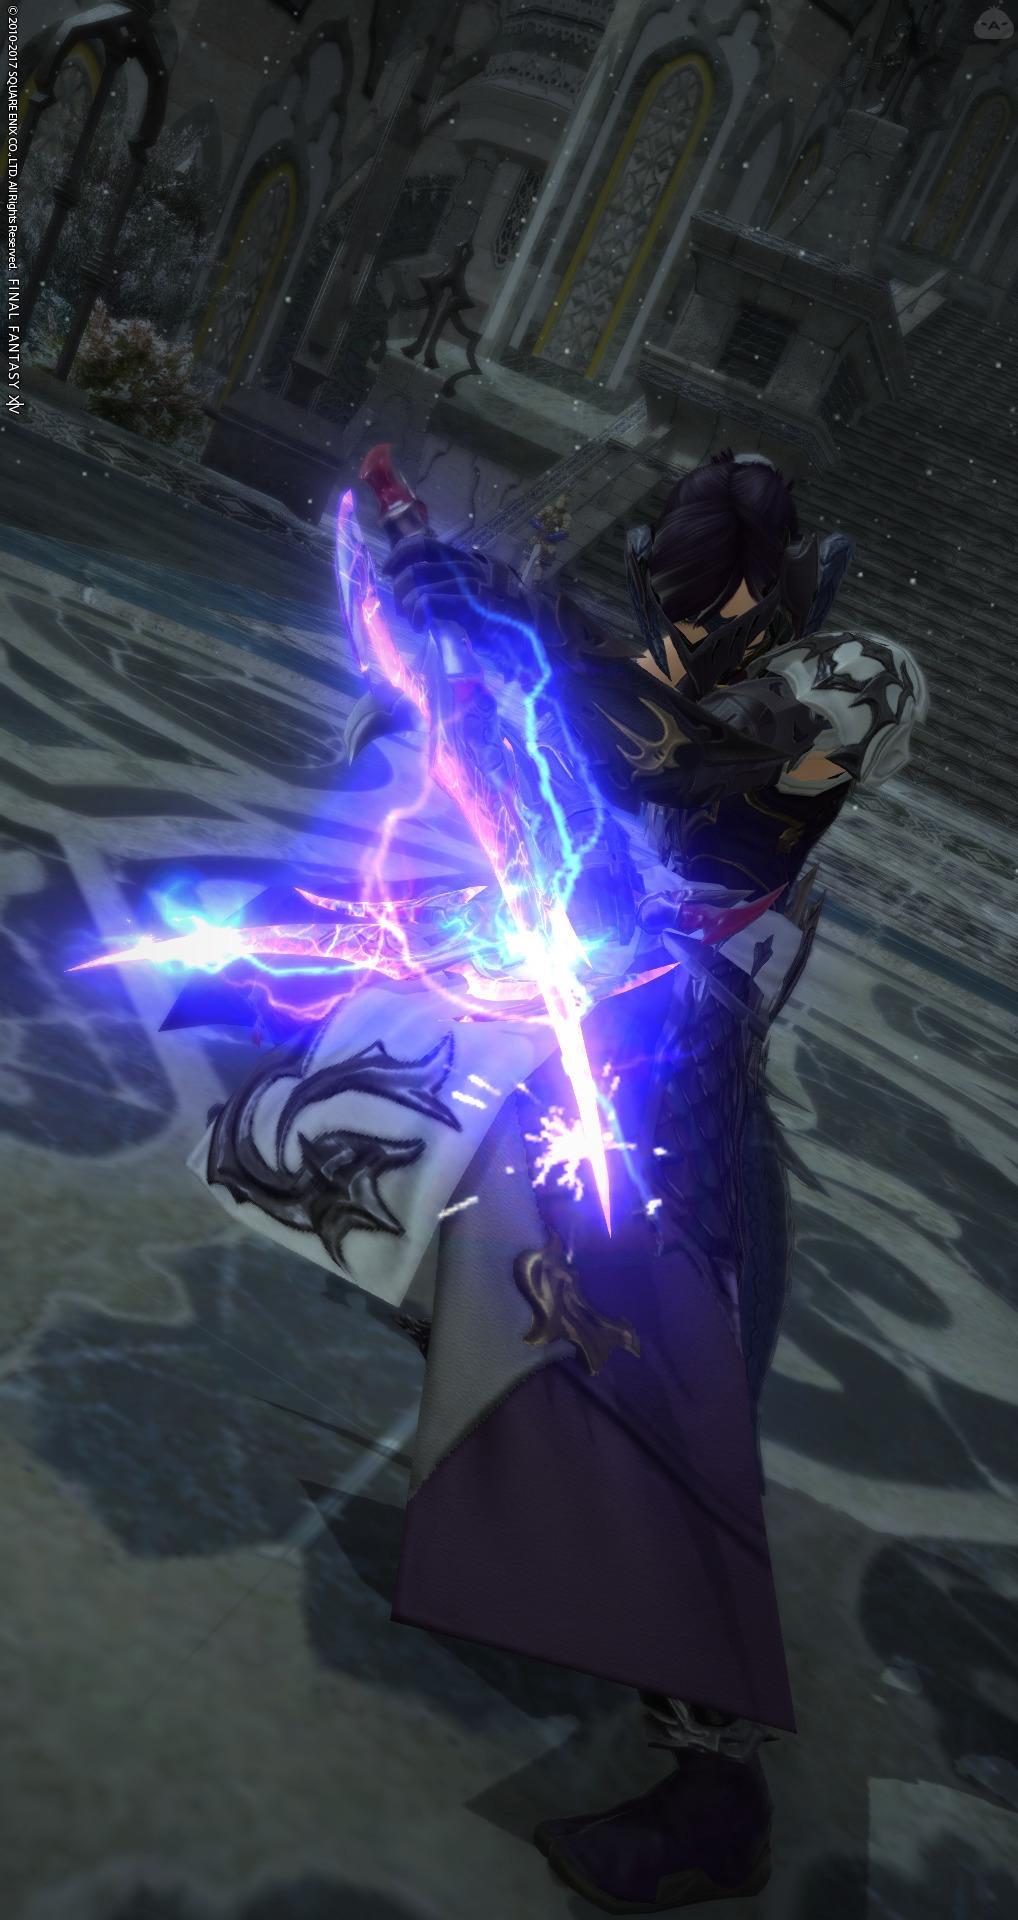 紫電の暗殺者